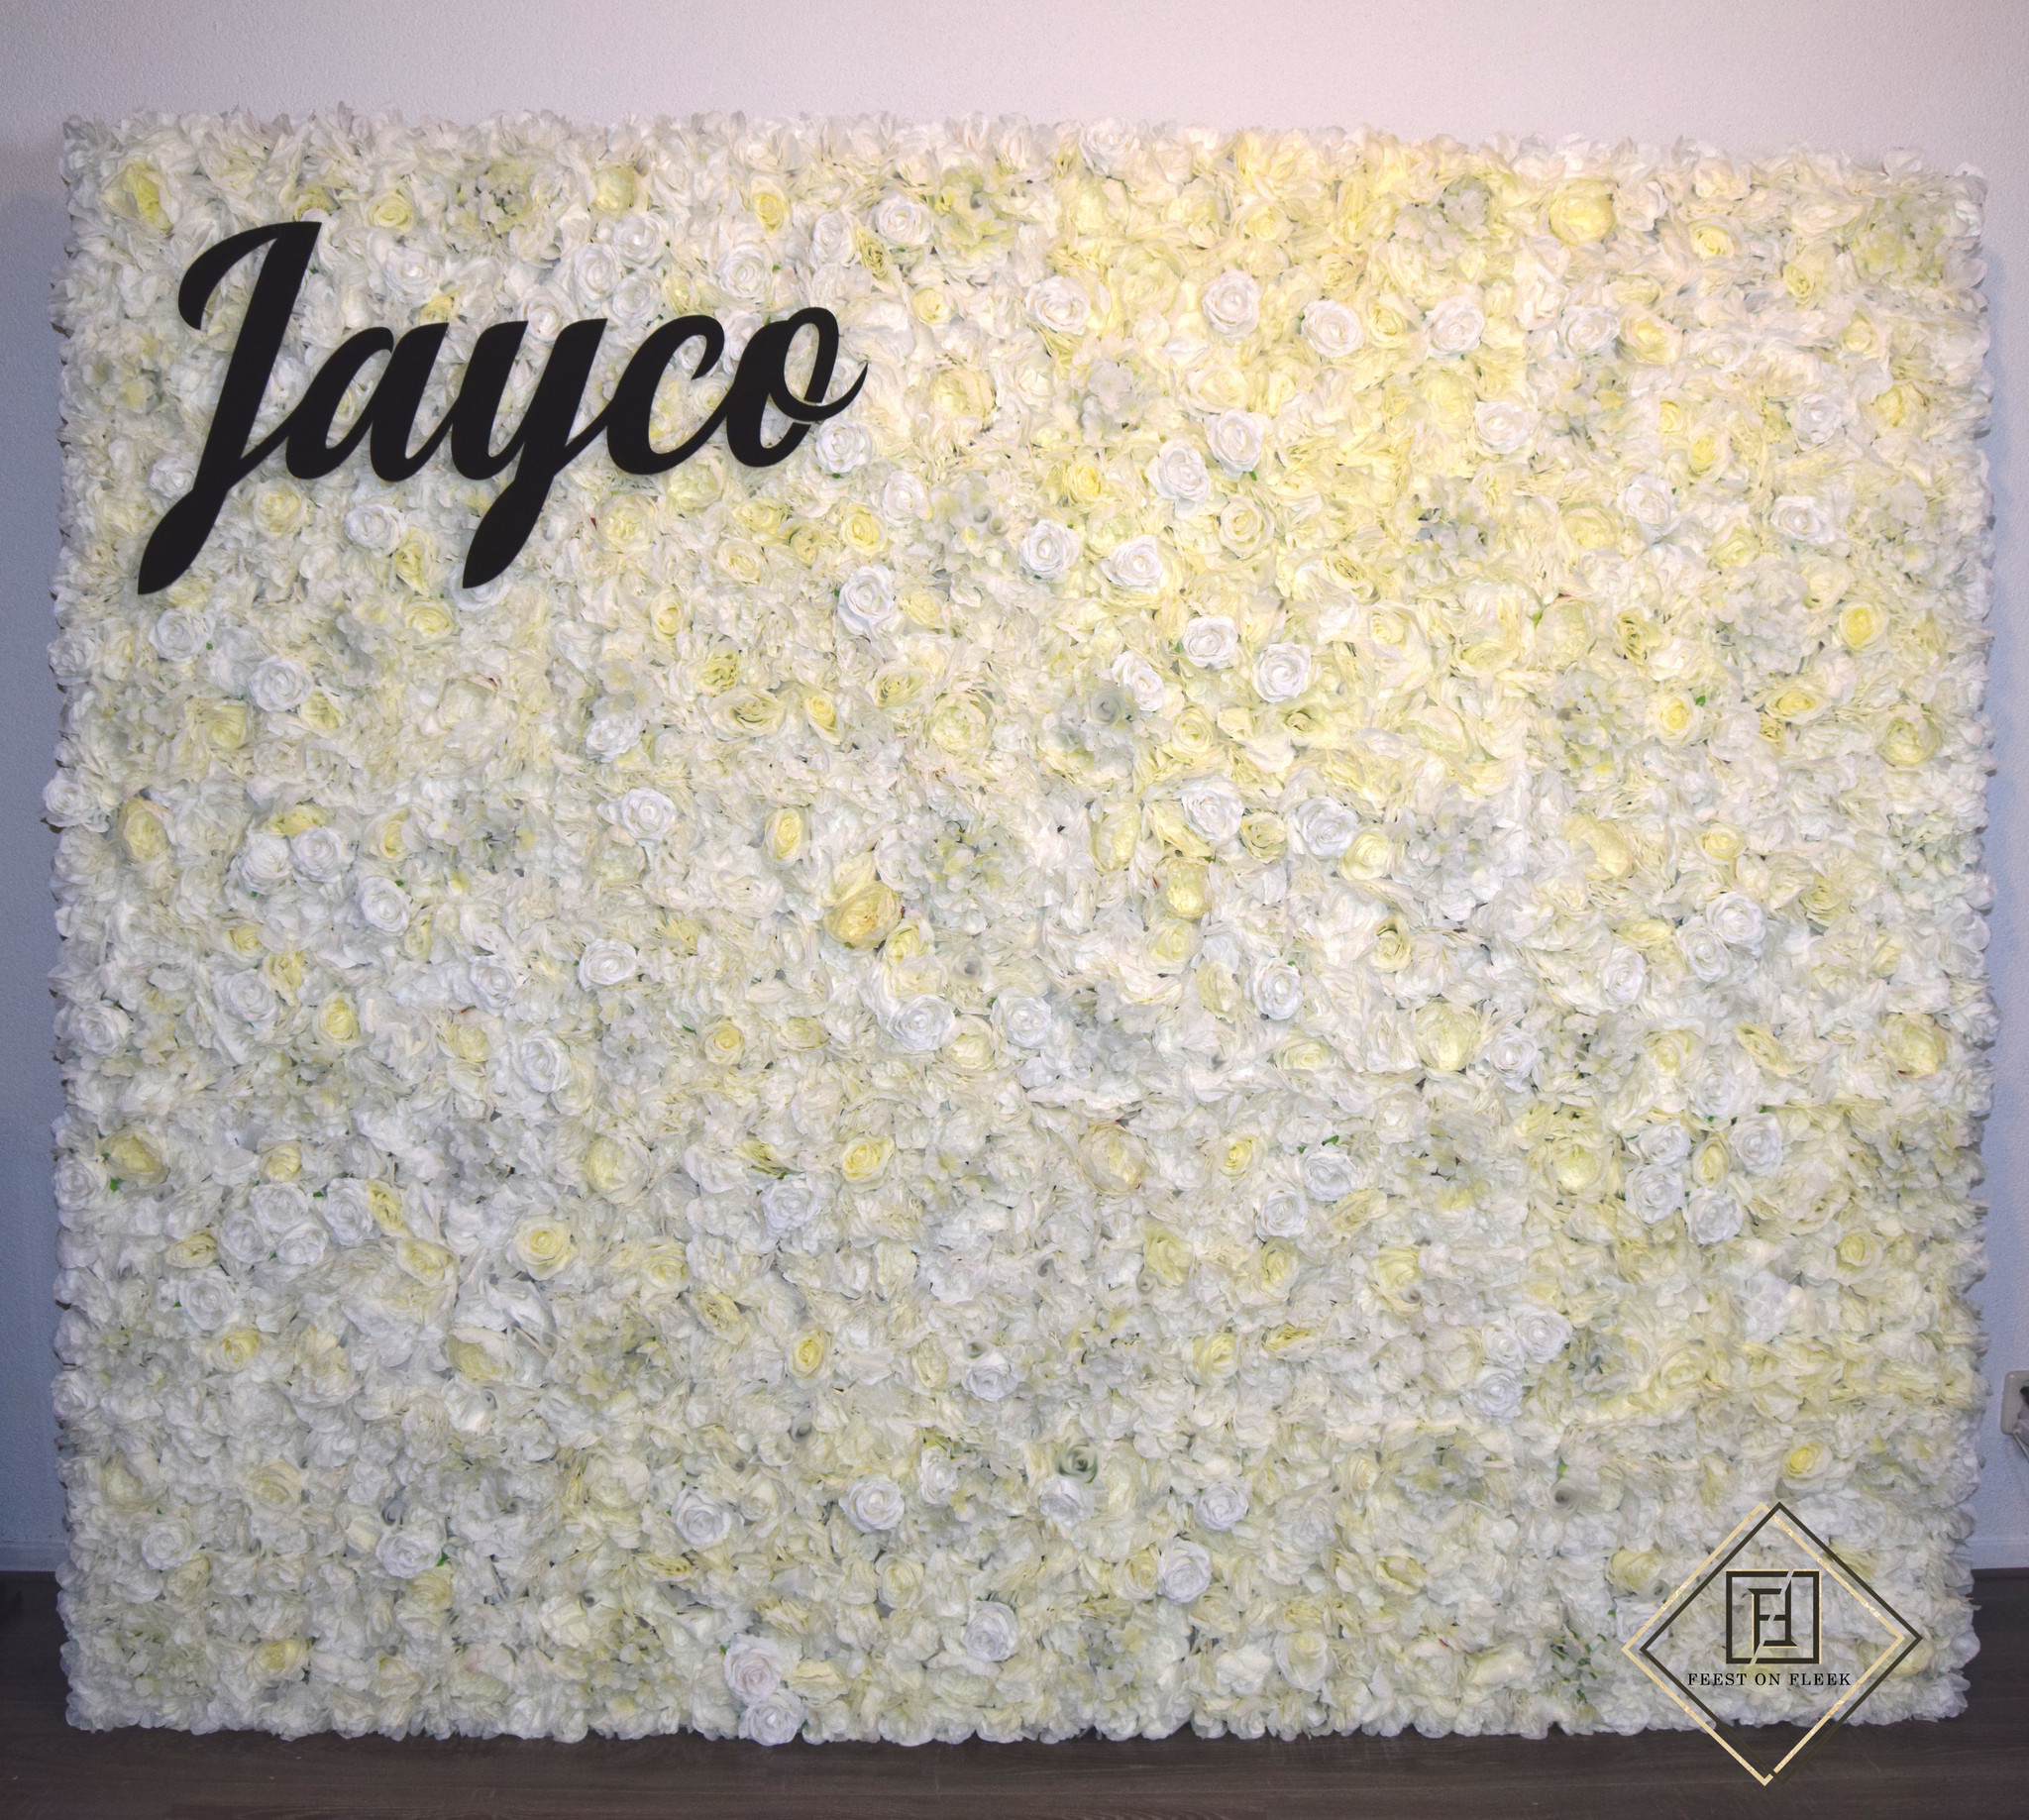 Ivory Flower Wall 120 x 200 (TE HUUR)